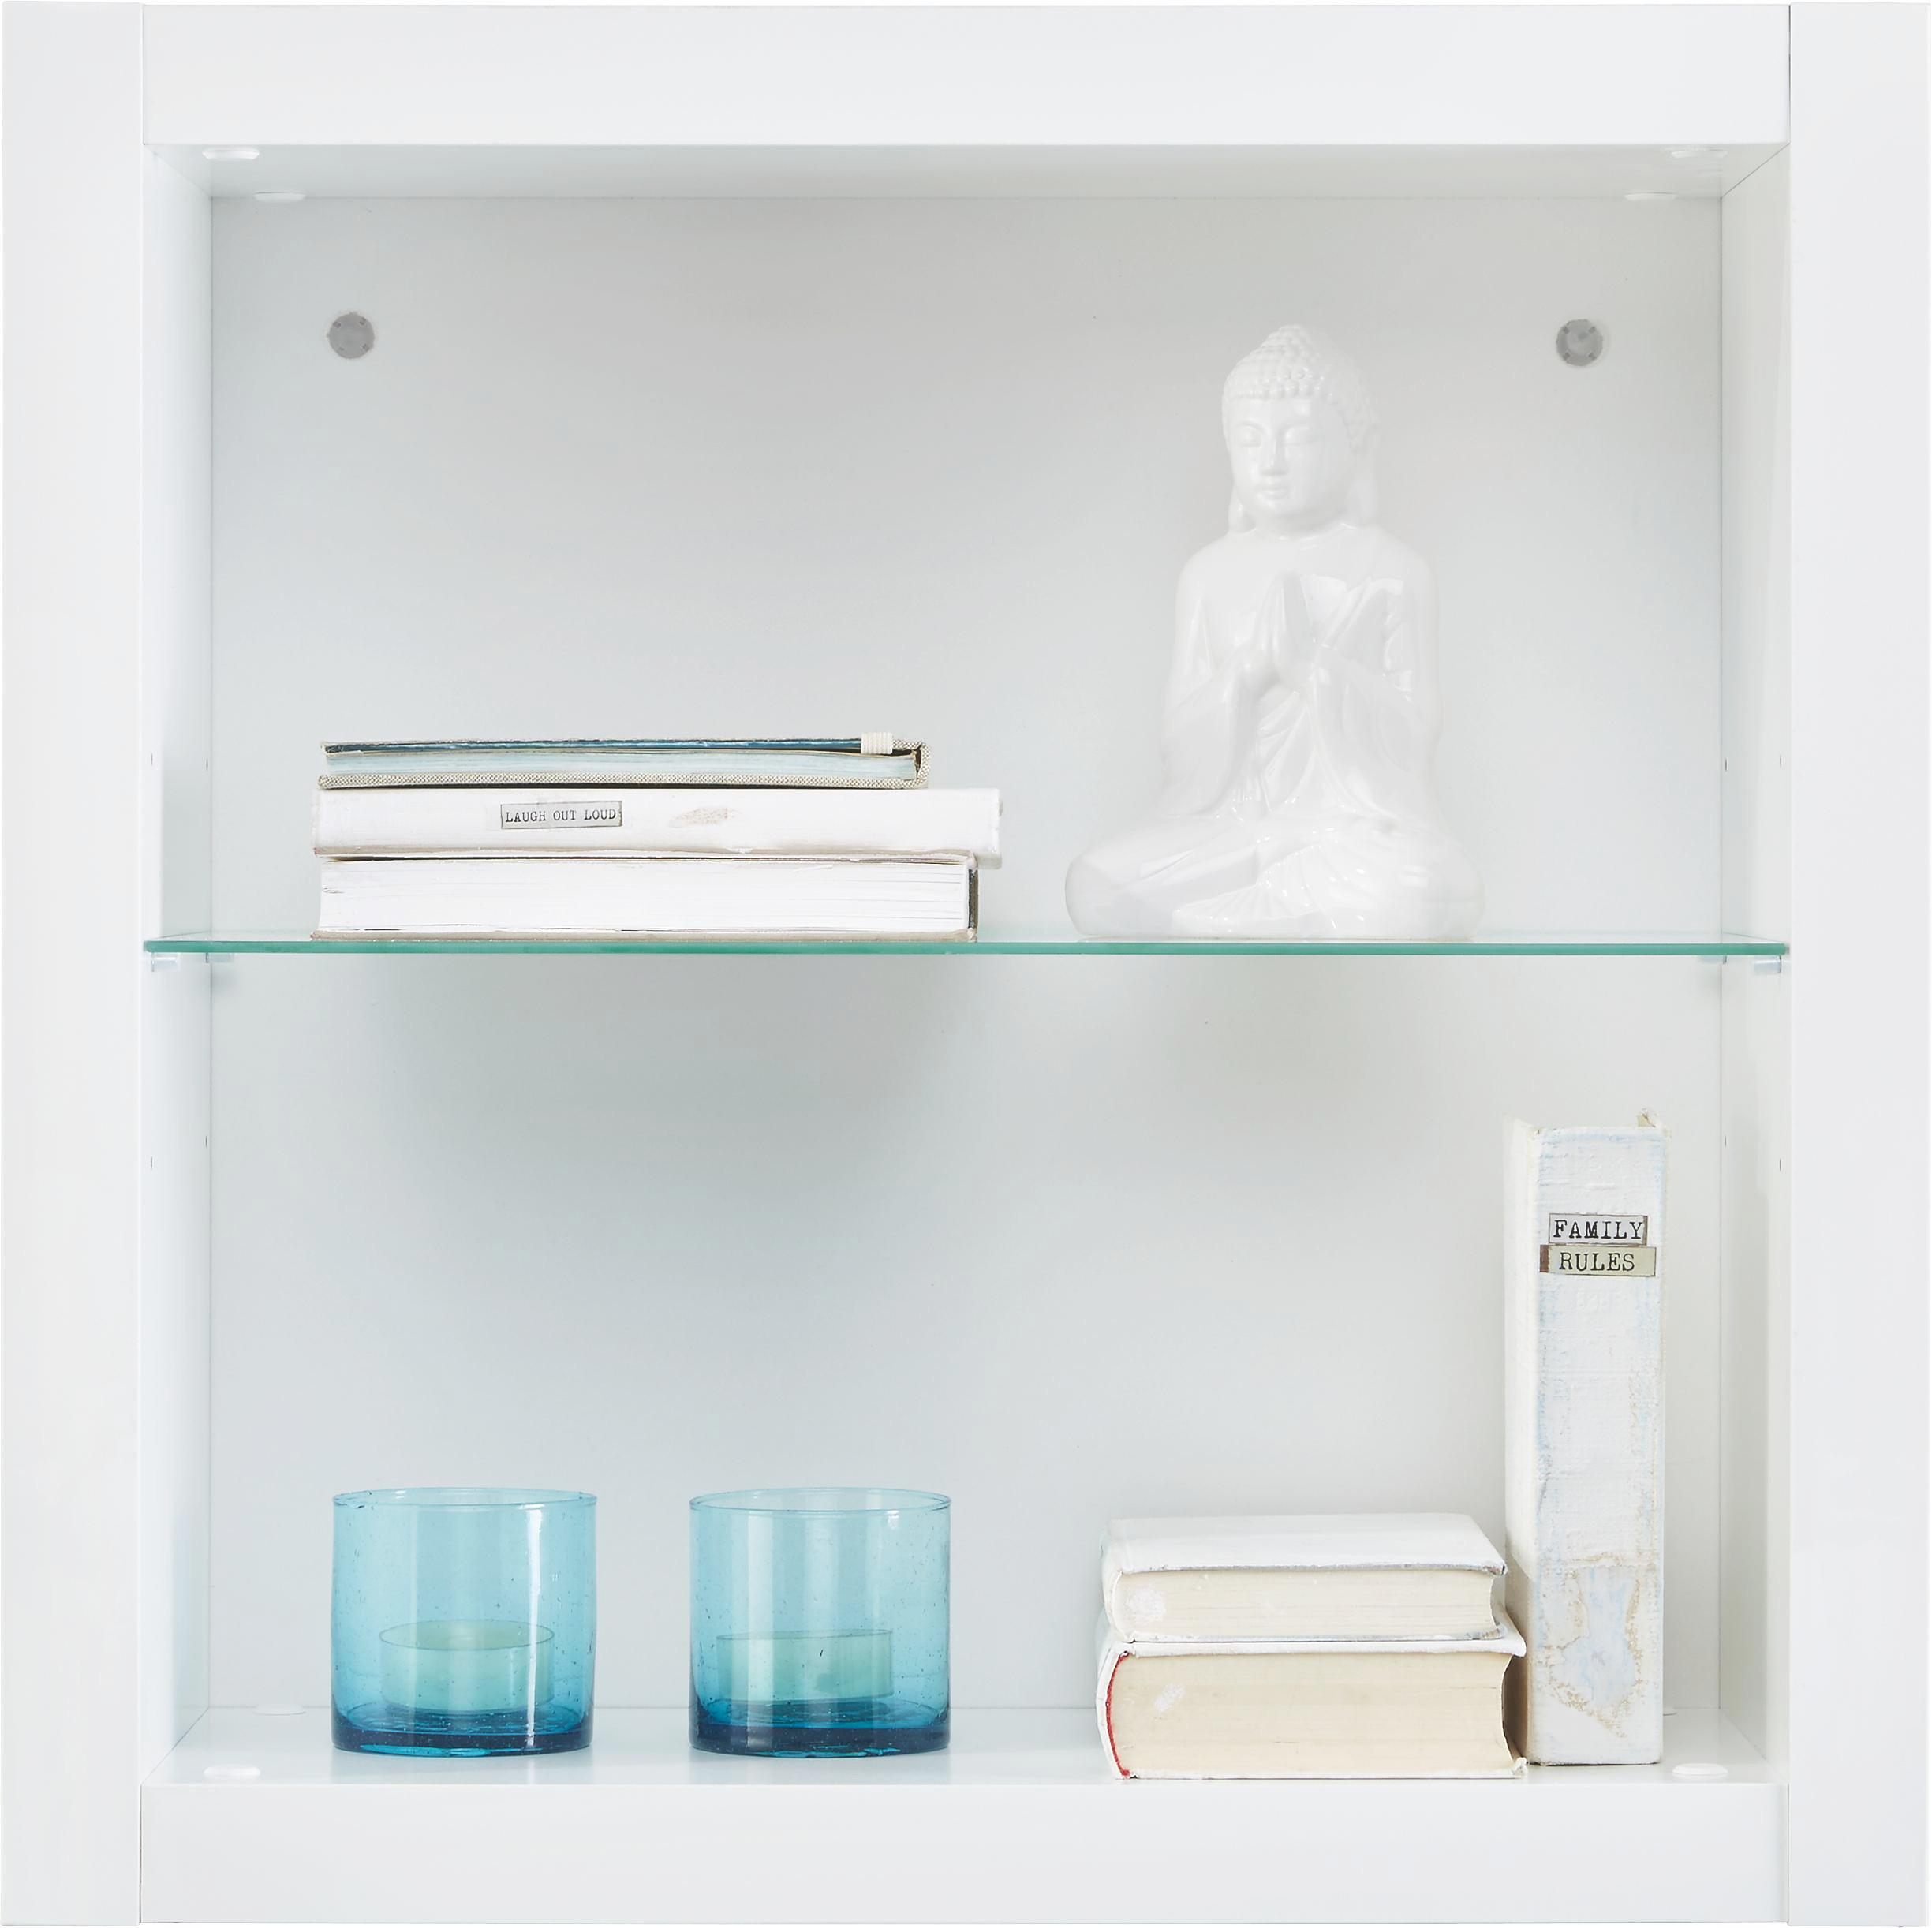 wandregal hochglanz wei full size of regal hochglanz weiss hause deko ideen regale weis poco. Black Bedroom Furniture Sets. Home Design Ideas